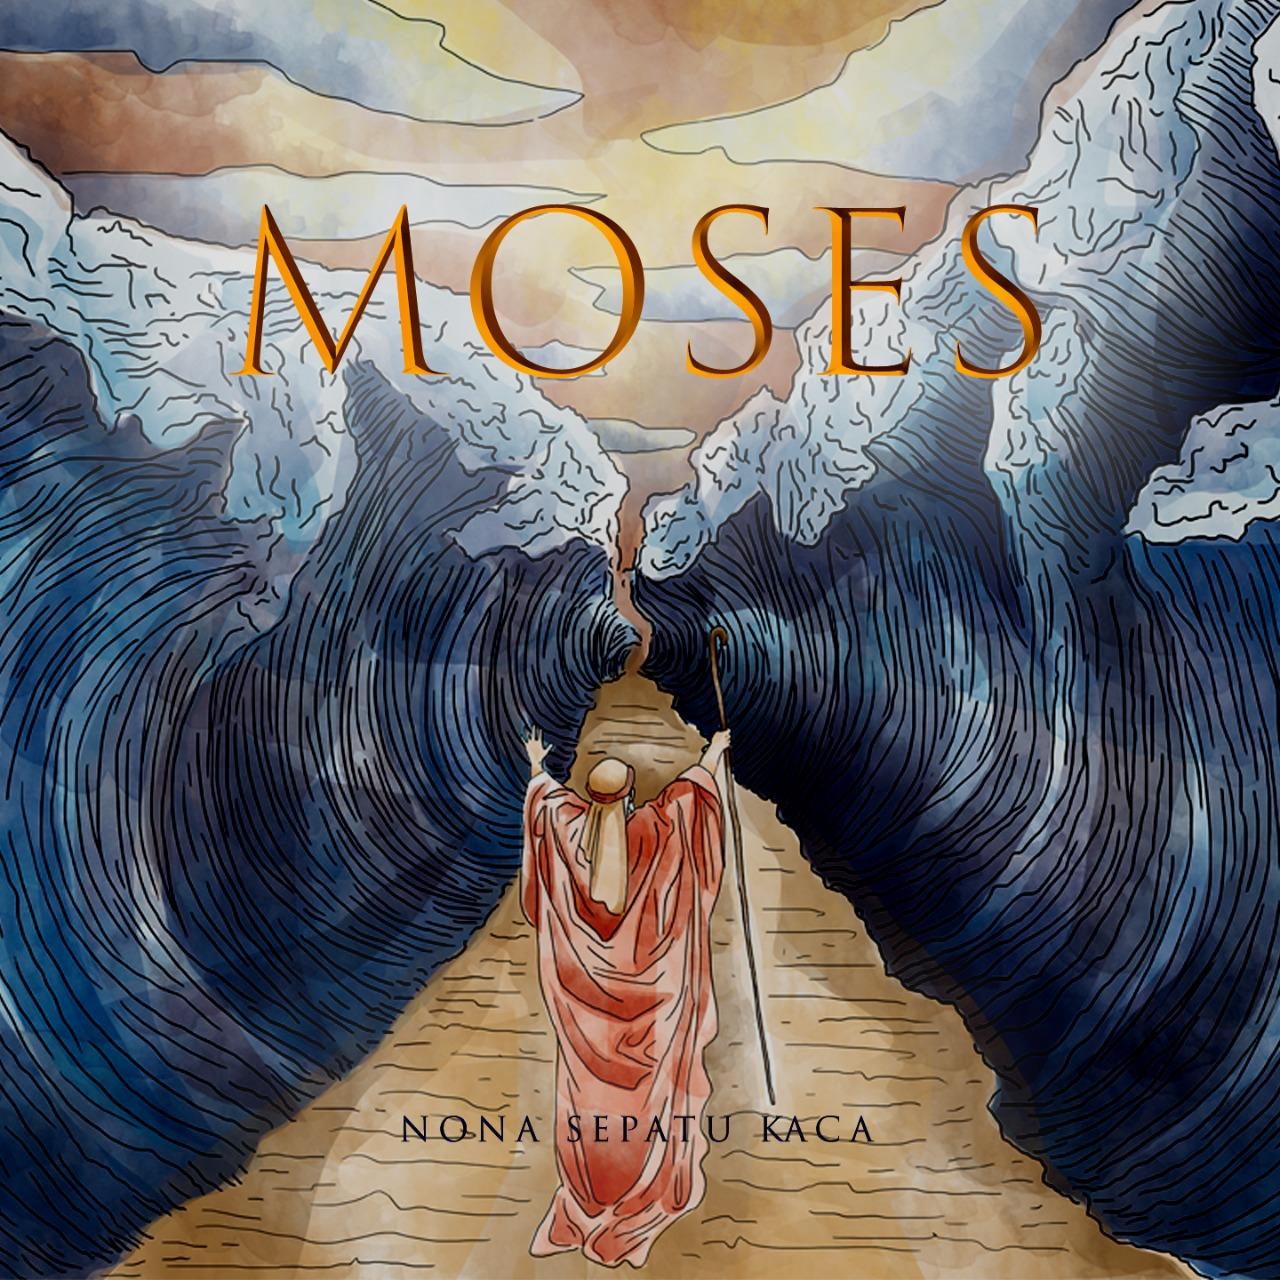 Artwork Moses Nona Sepatu Kaca